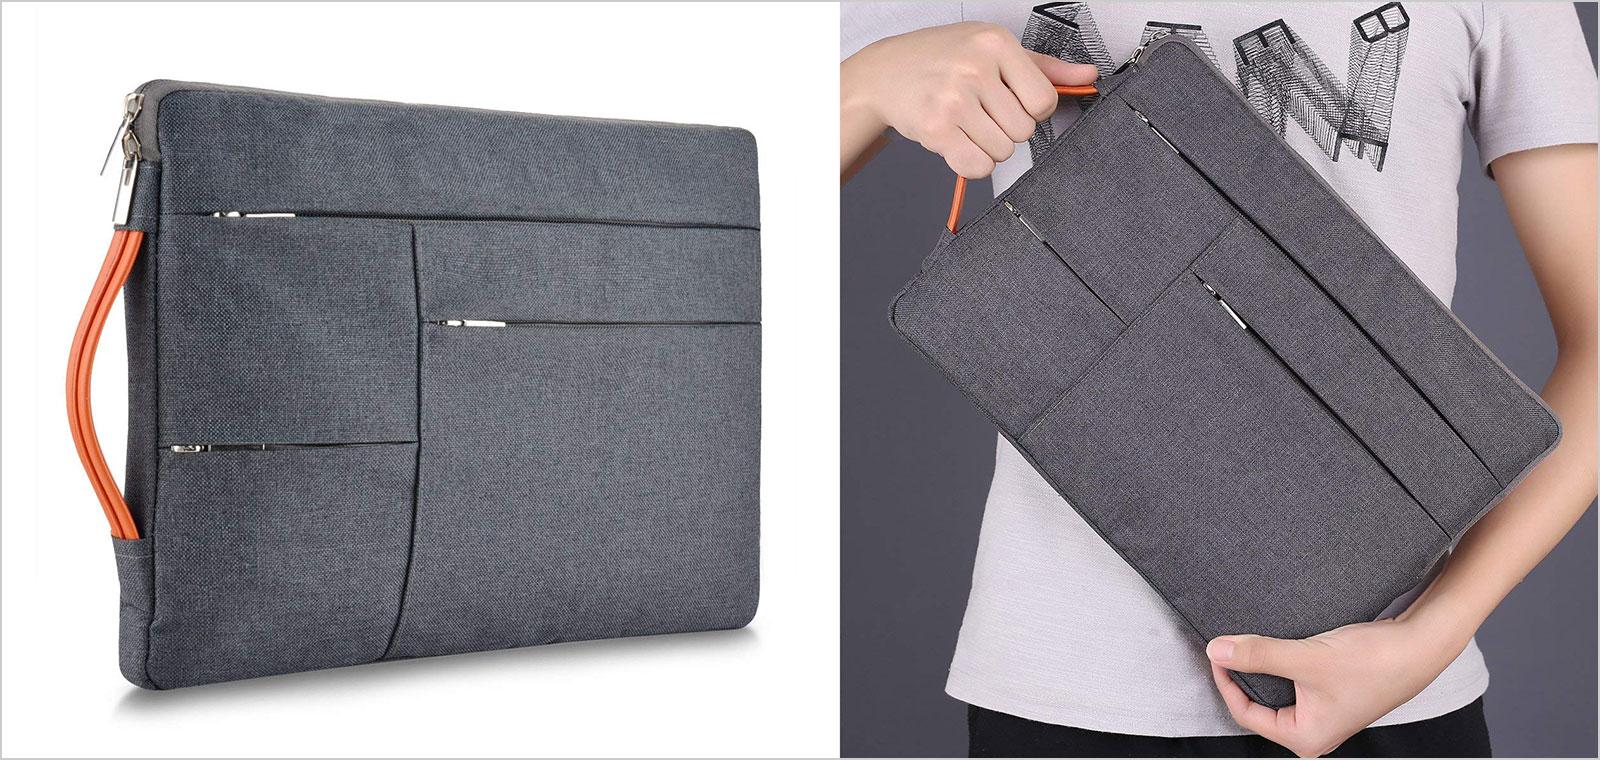 Waterproof-and-Multi-Pocket-Sleeve-Handbag-Compatible-12